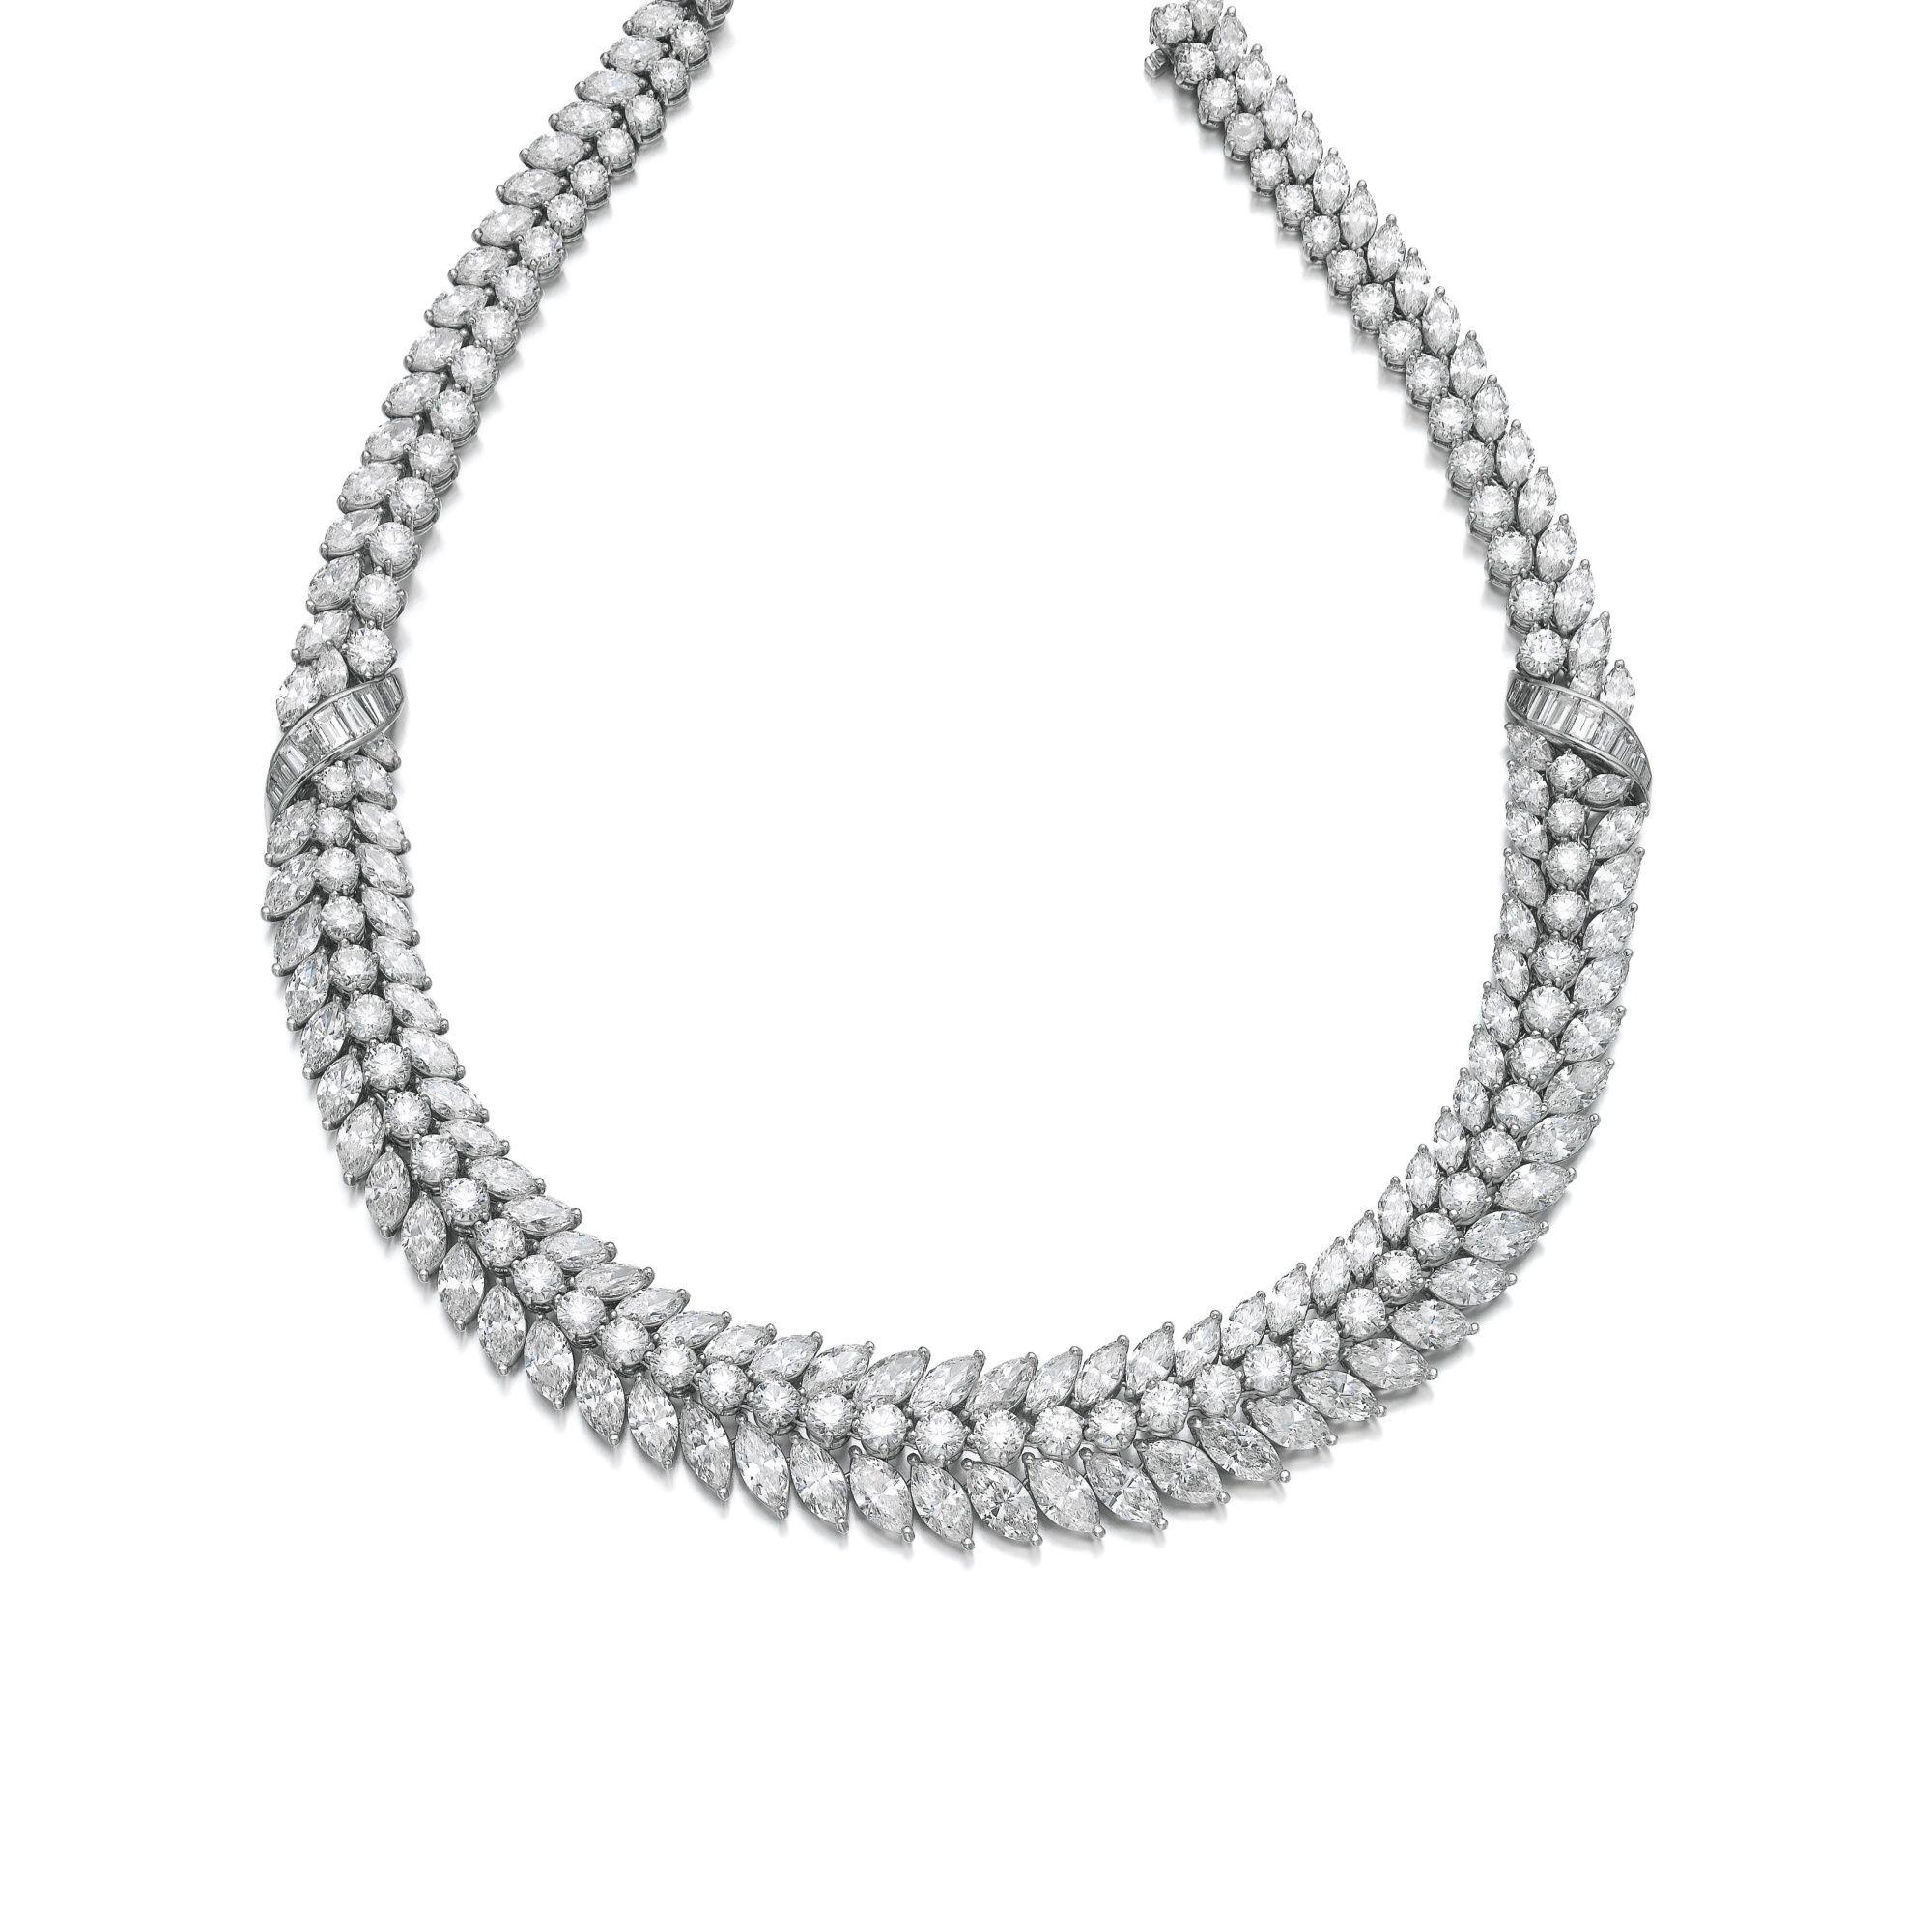 Diamond necklace lot sothebyus jewlery pinterest diamond